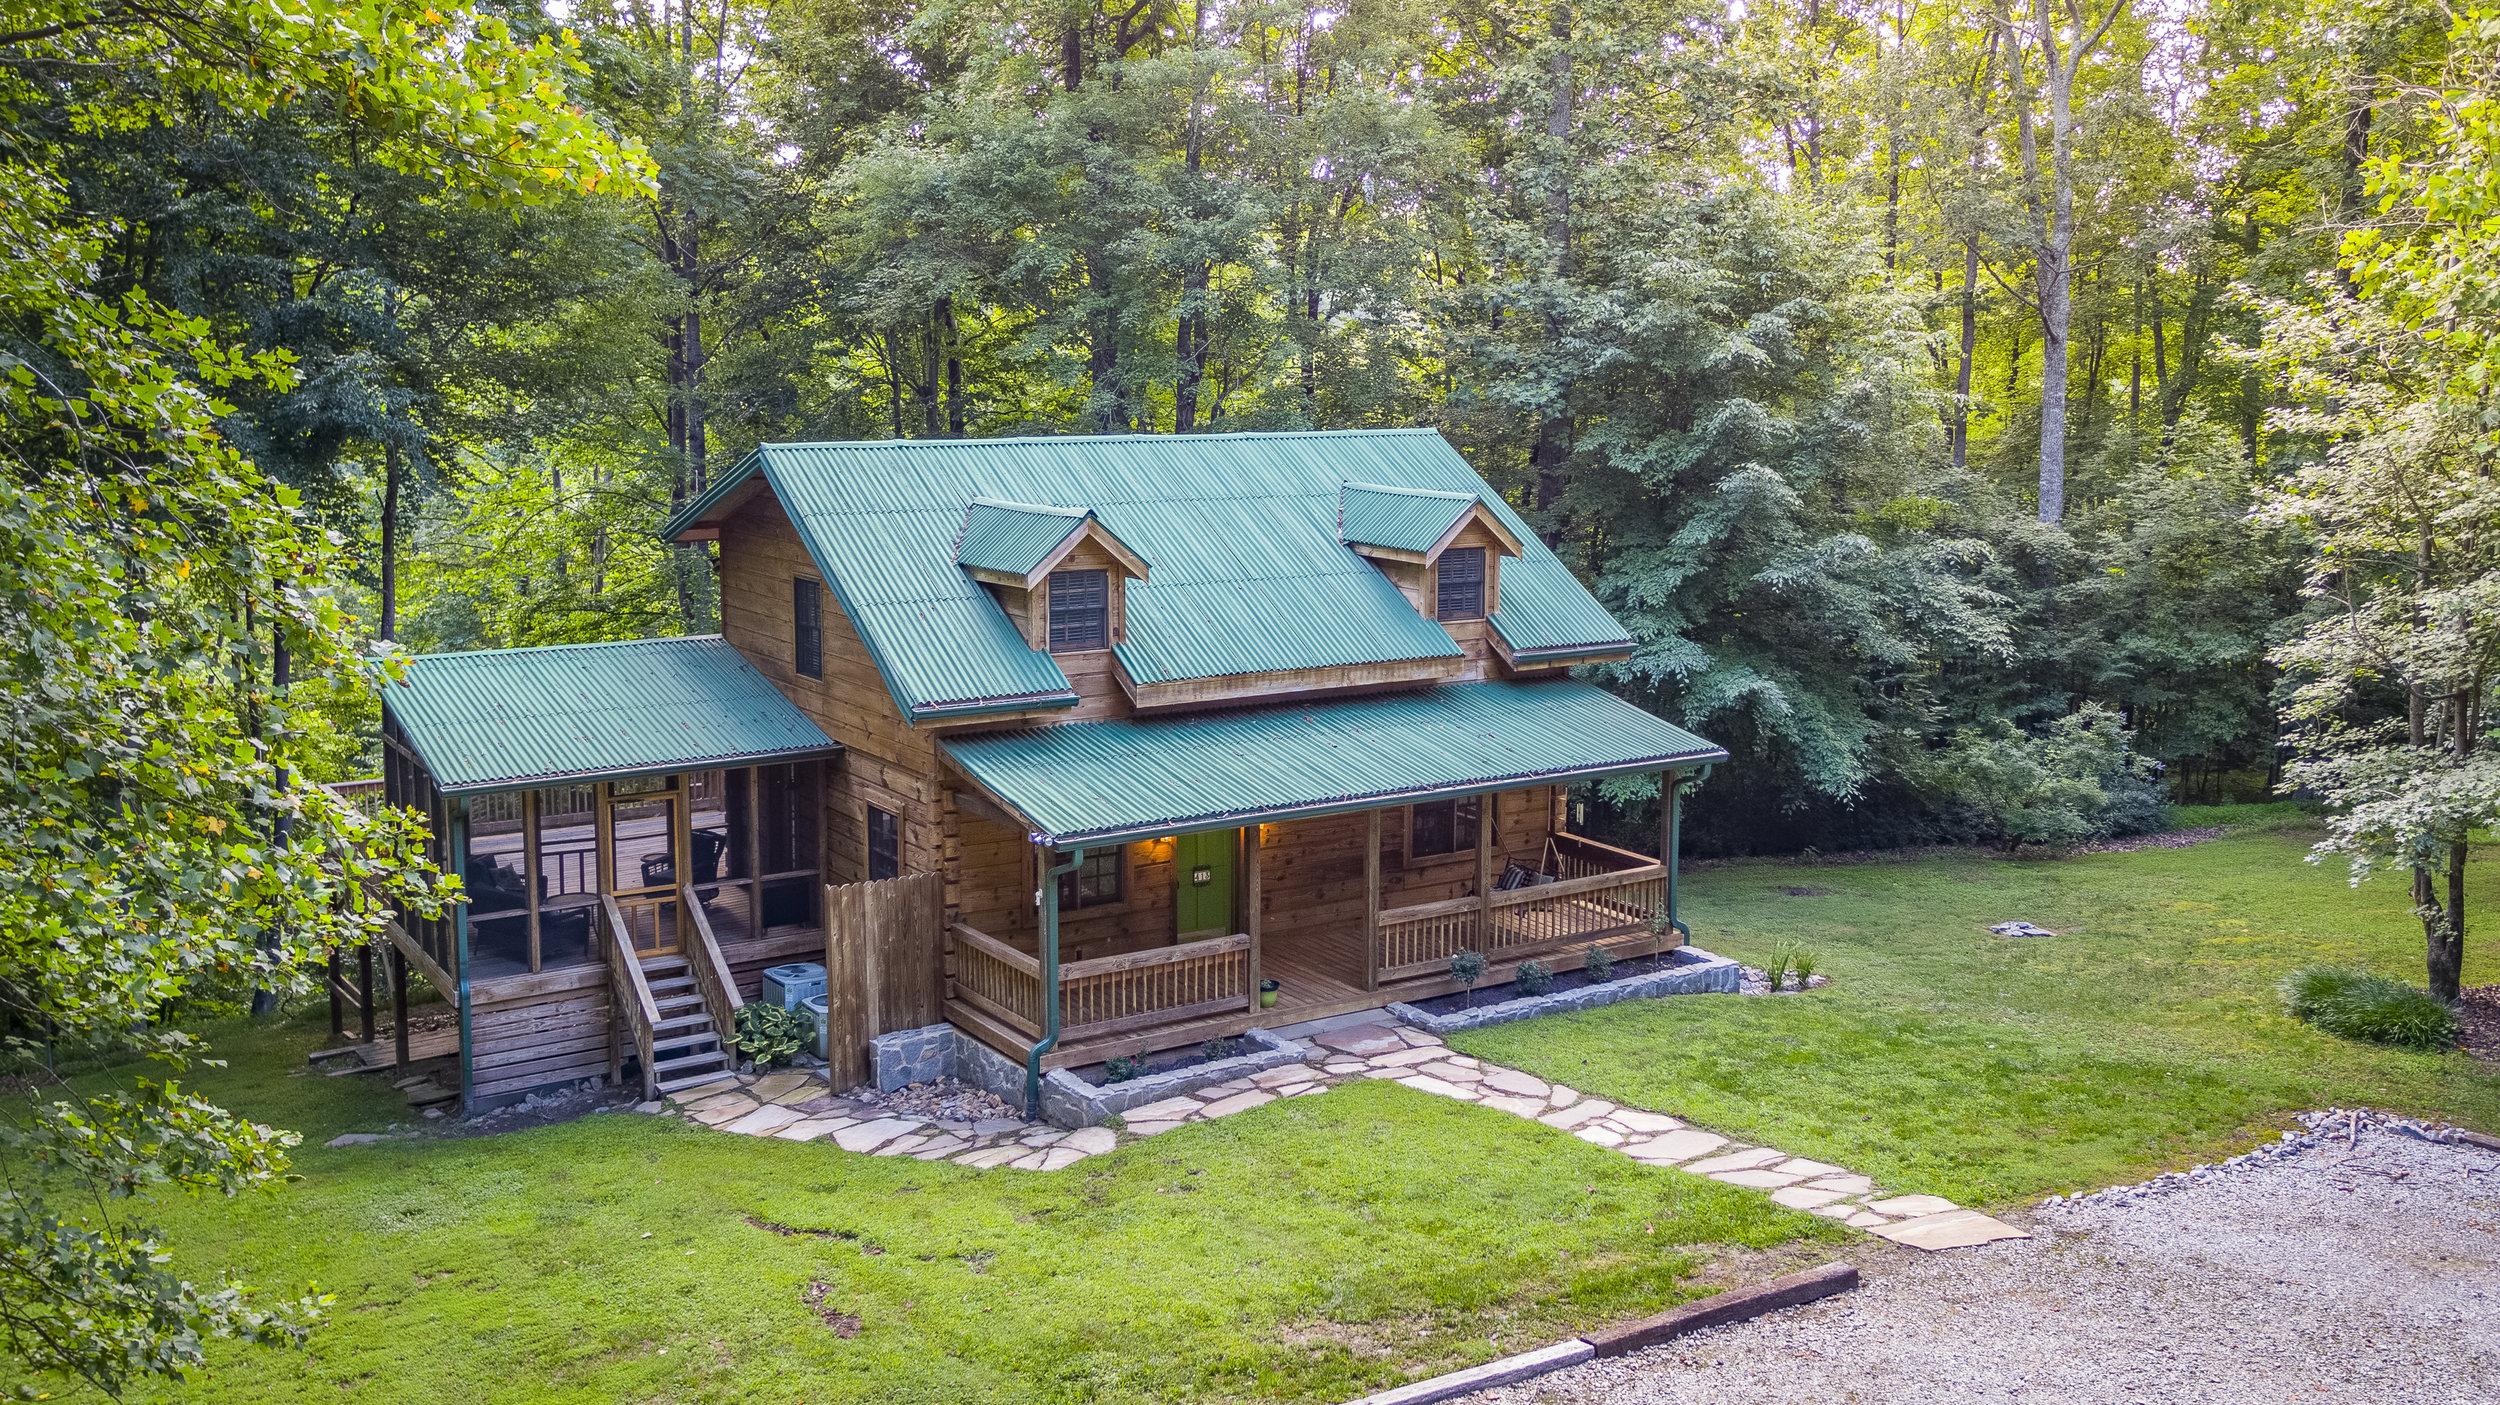 real-estate-photography-drone-photographer-drone-greensboro-nc-triad-211.jpg